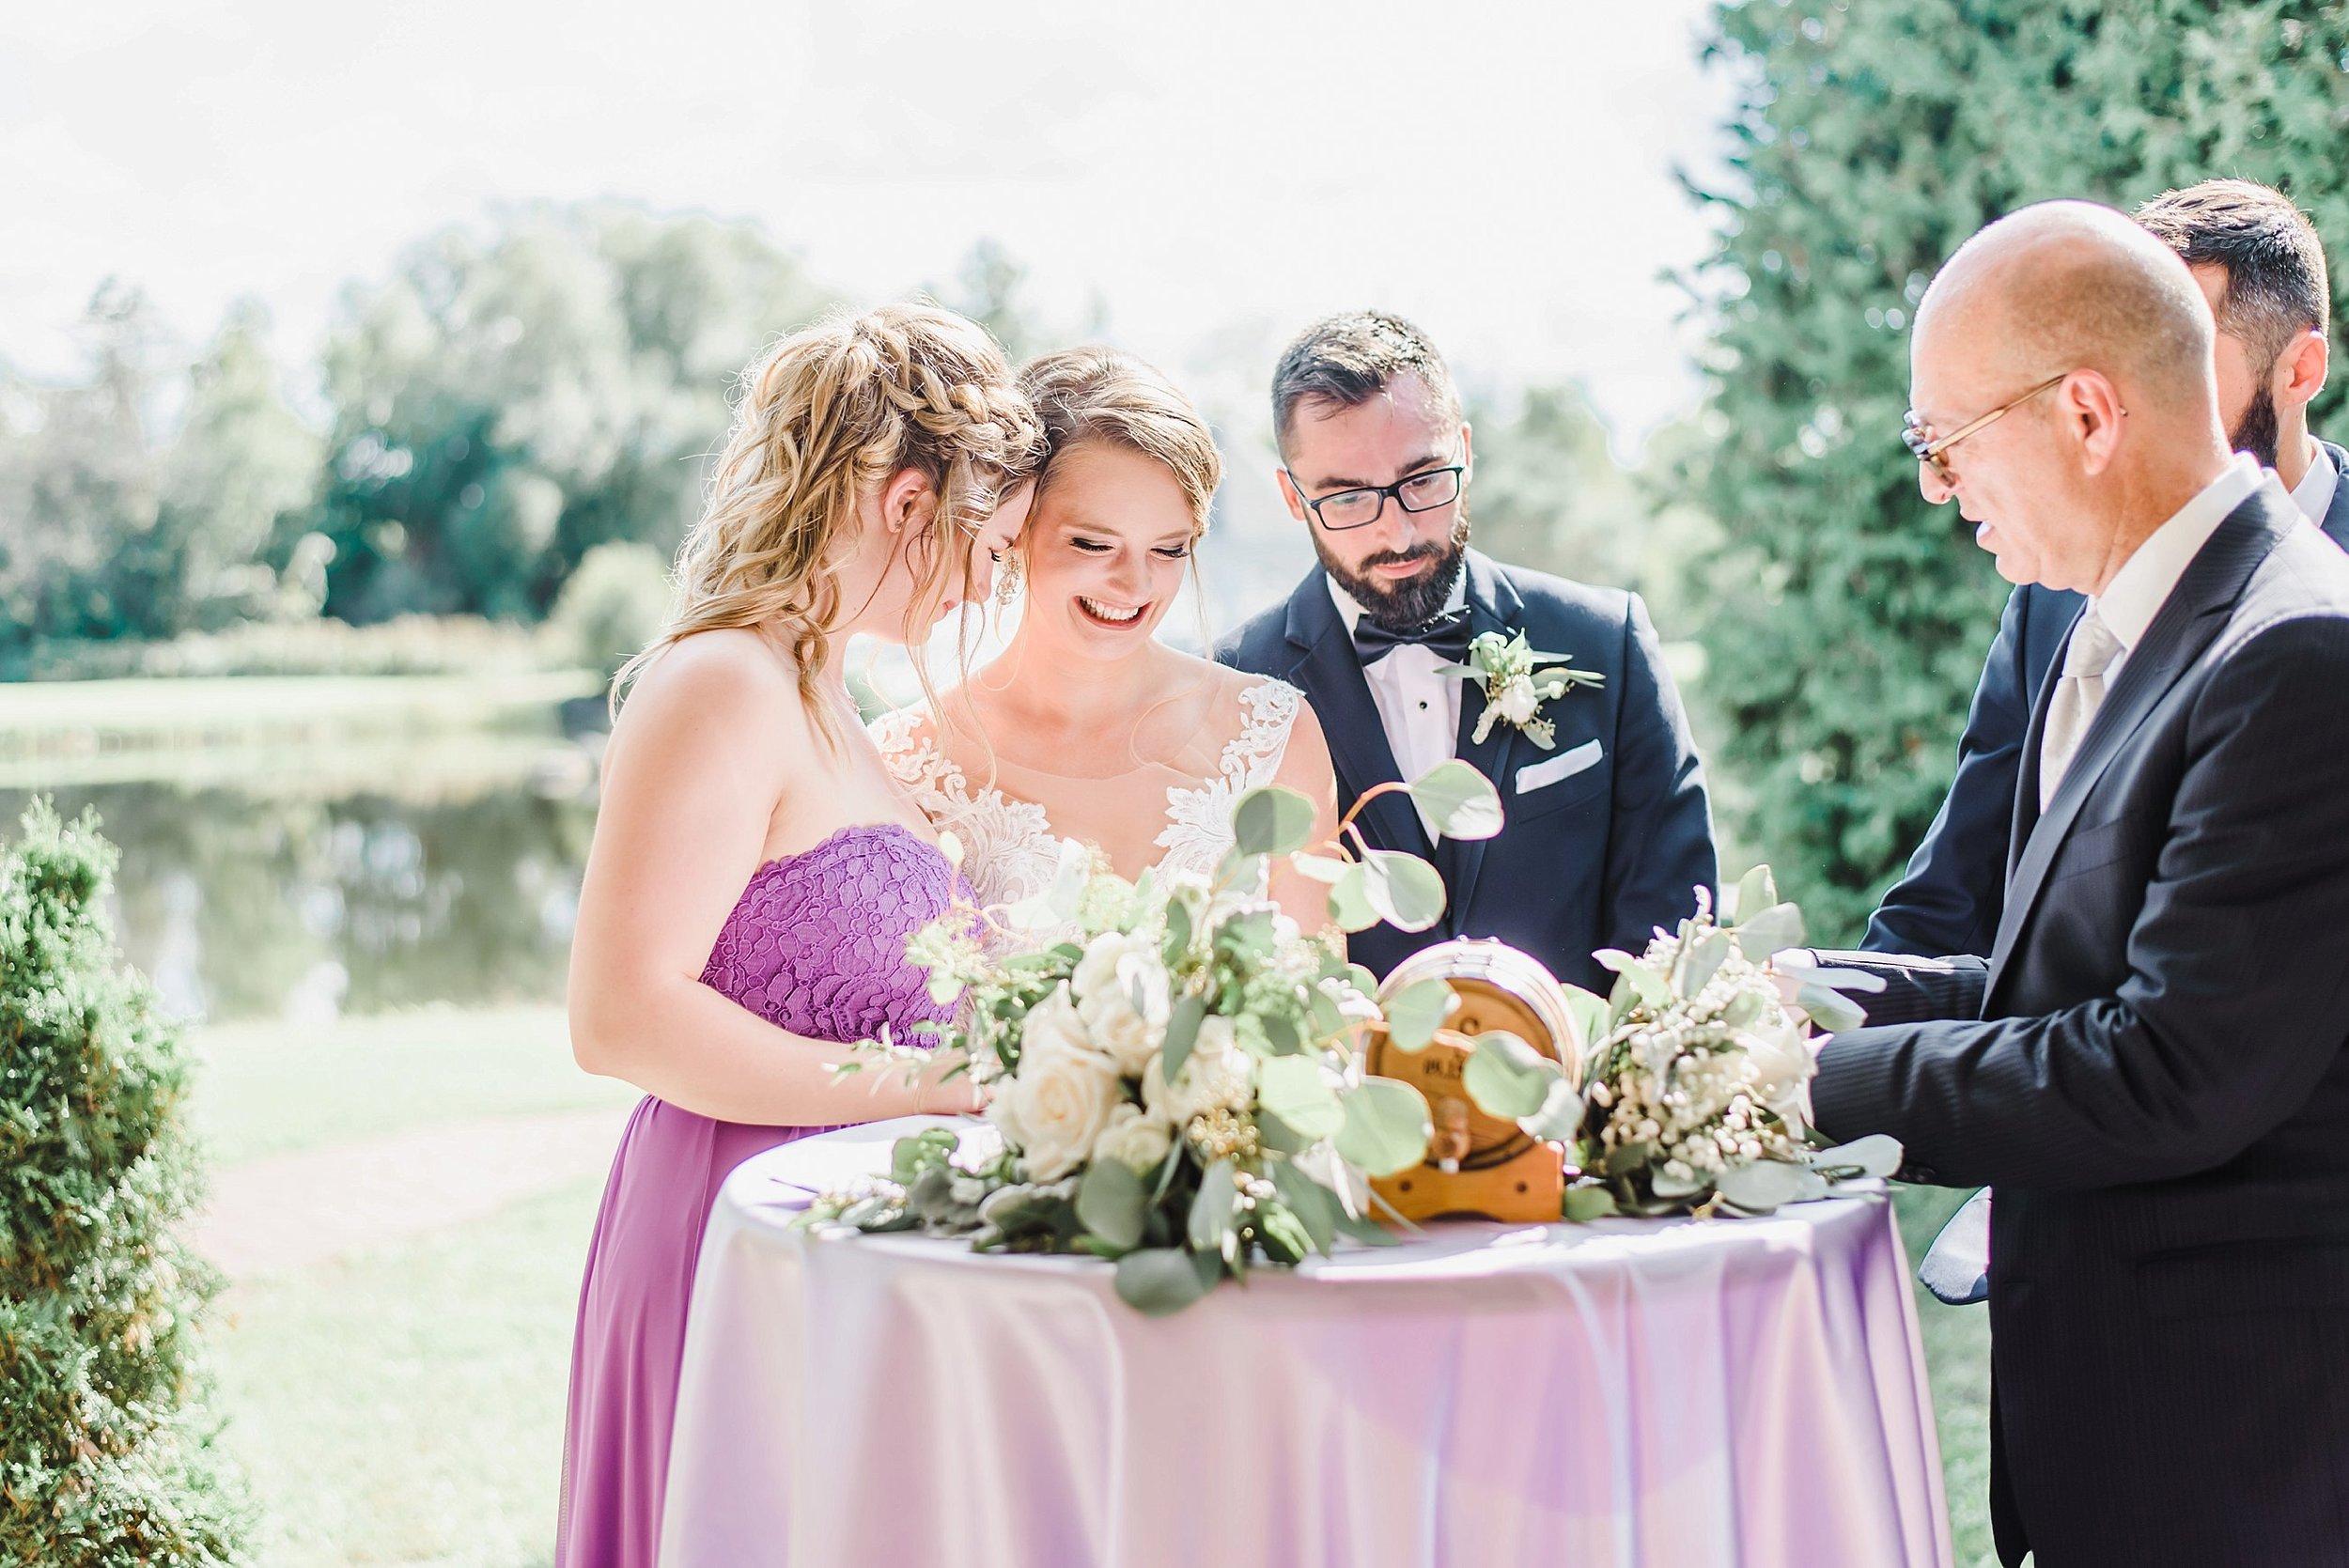 light airy indie fine art ottawa wedding photographer | Ali and Batoul Photography_1279.jpg